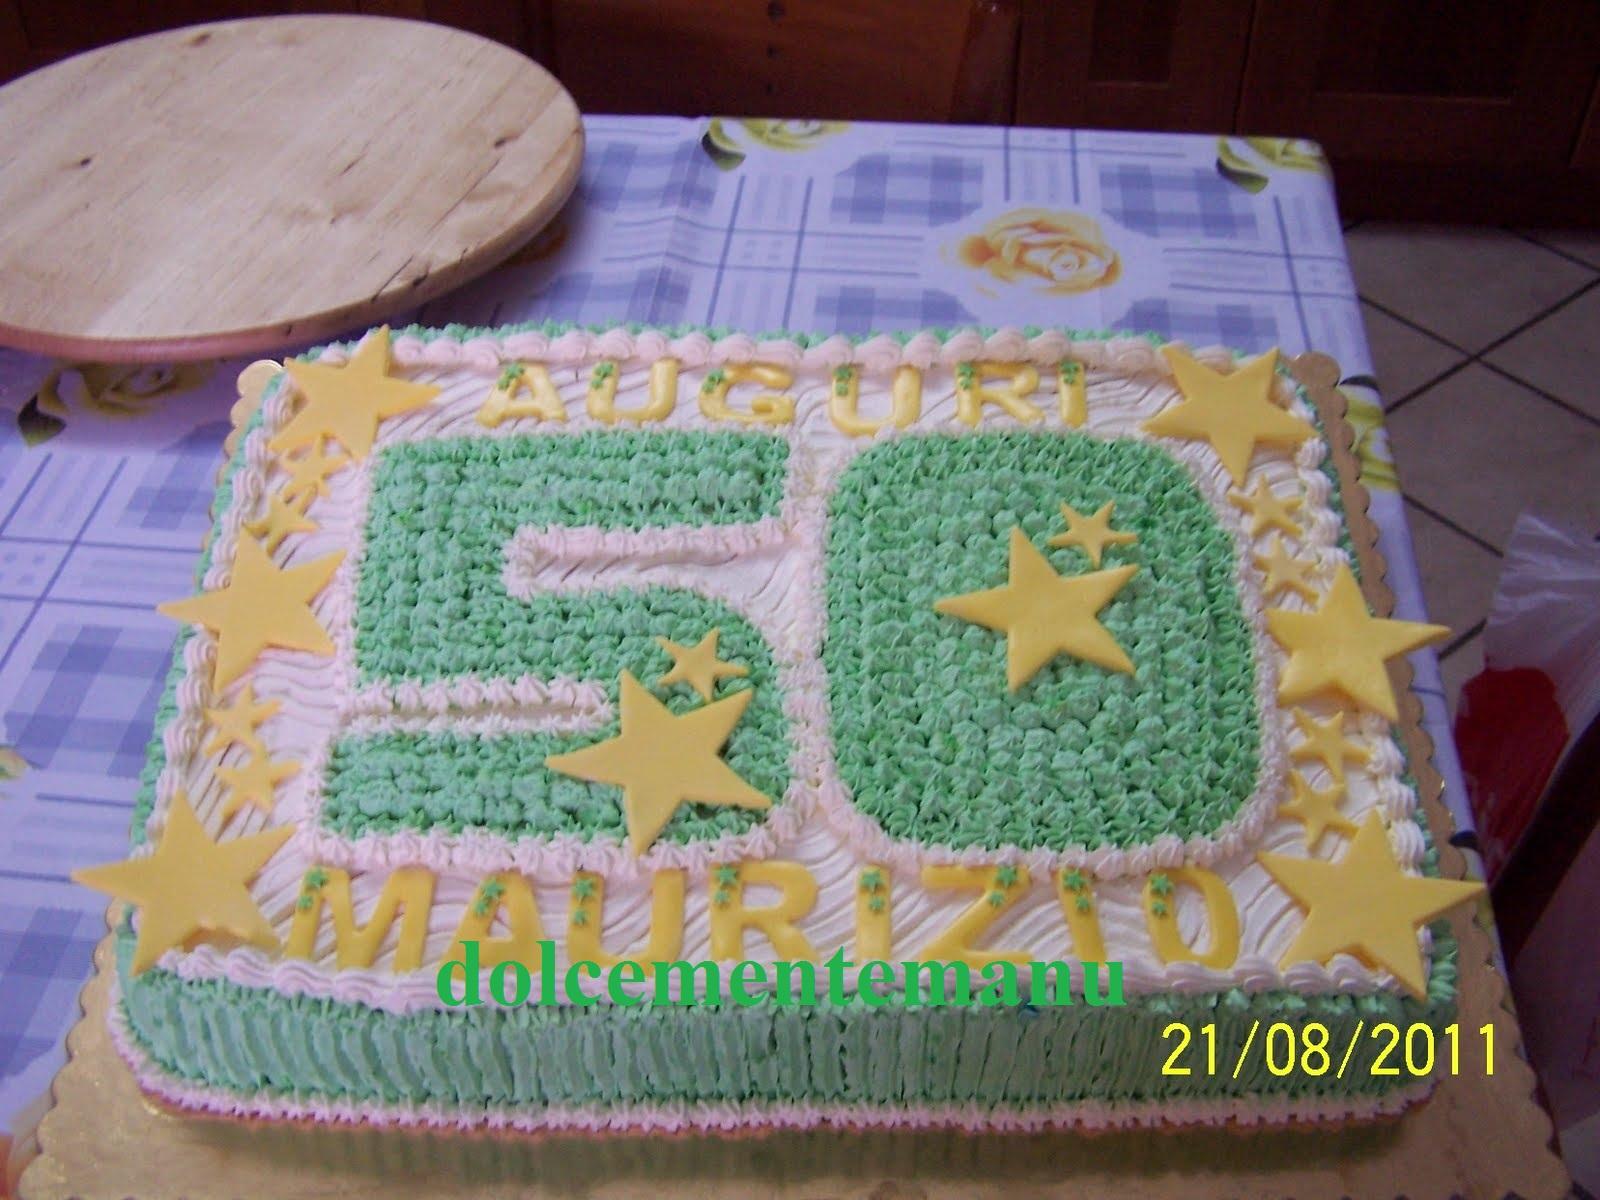 Molto dolcementemanu: torta x 50 anni !!! HR88